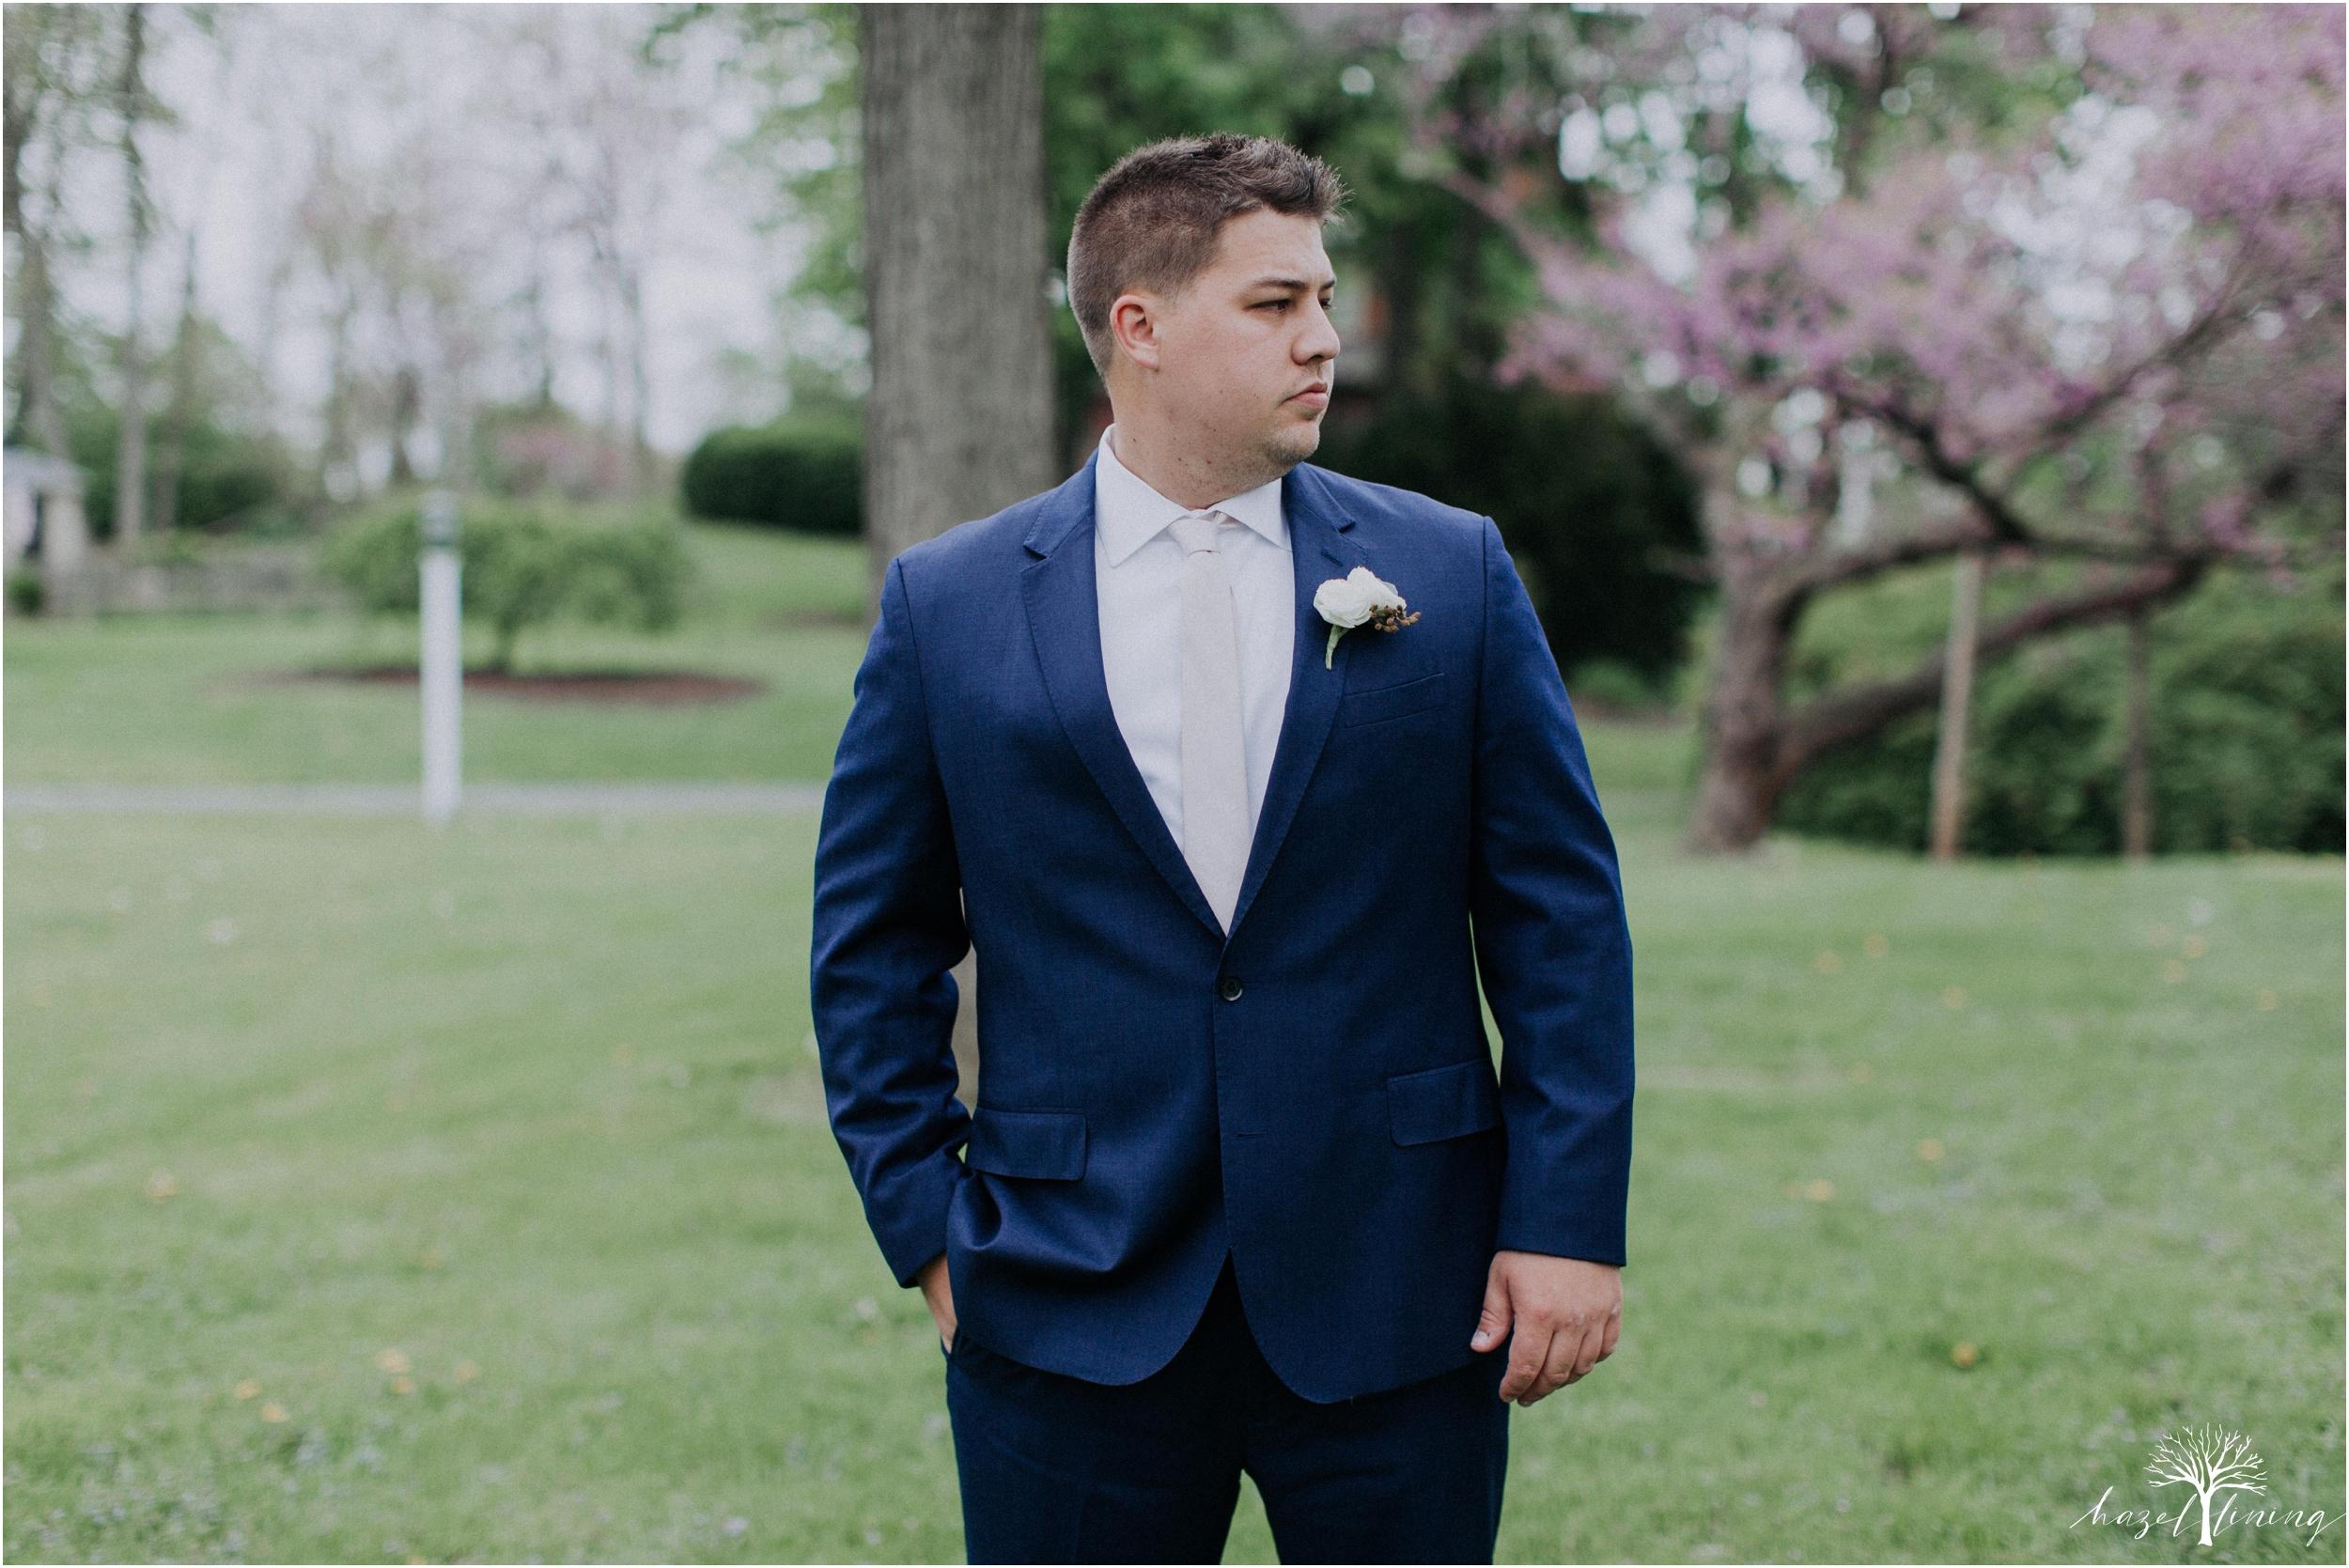 hazel-lining-travel-wedding-elopement-photography-abby-skyler-hunt-the-willis-house-york-pennsylvania-outdoor-estate-wedding_0017.jpg